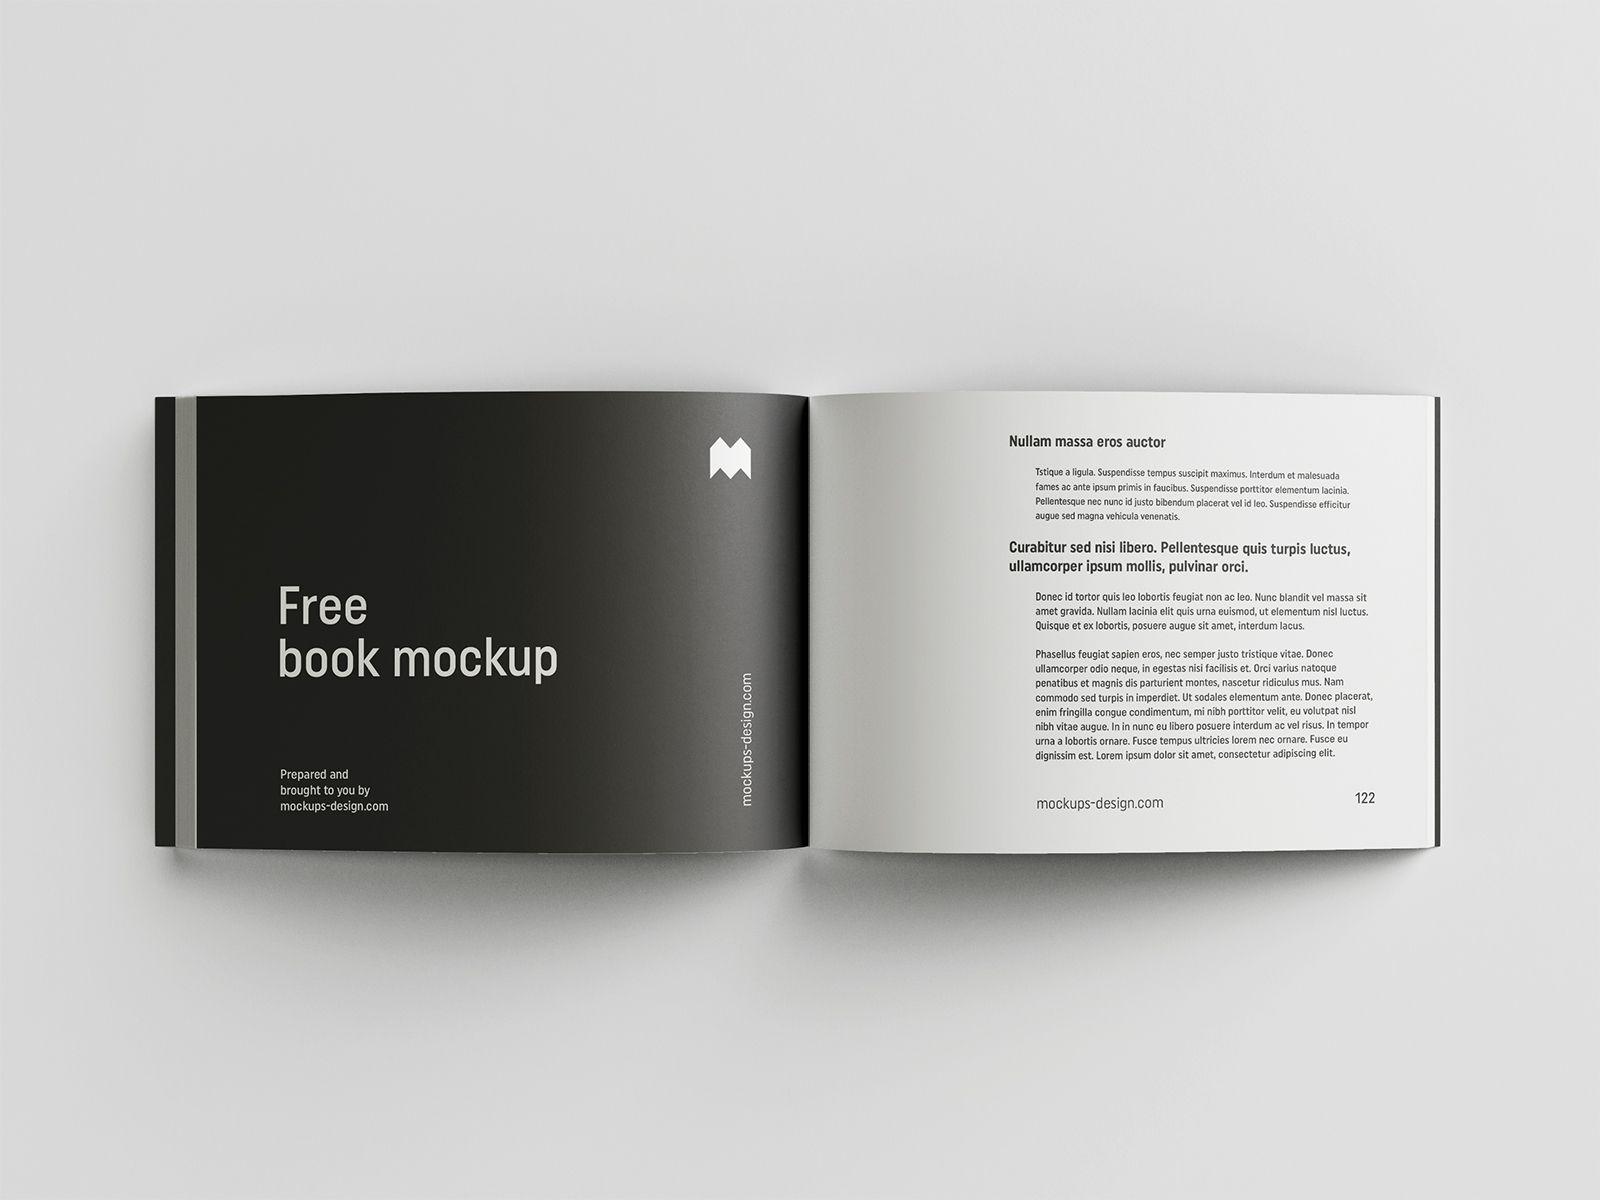 Free Landscape Book Mockup Free Mockup Free Mockup Mockup Free Psd Mockup Psd